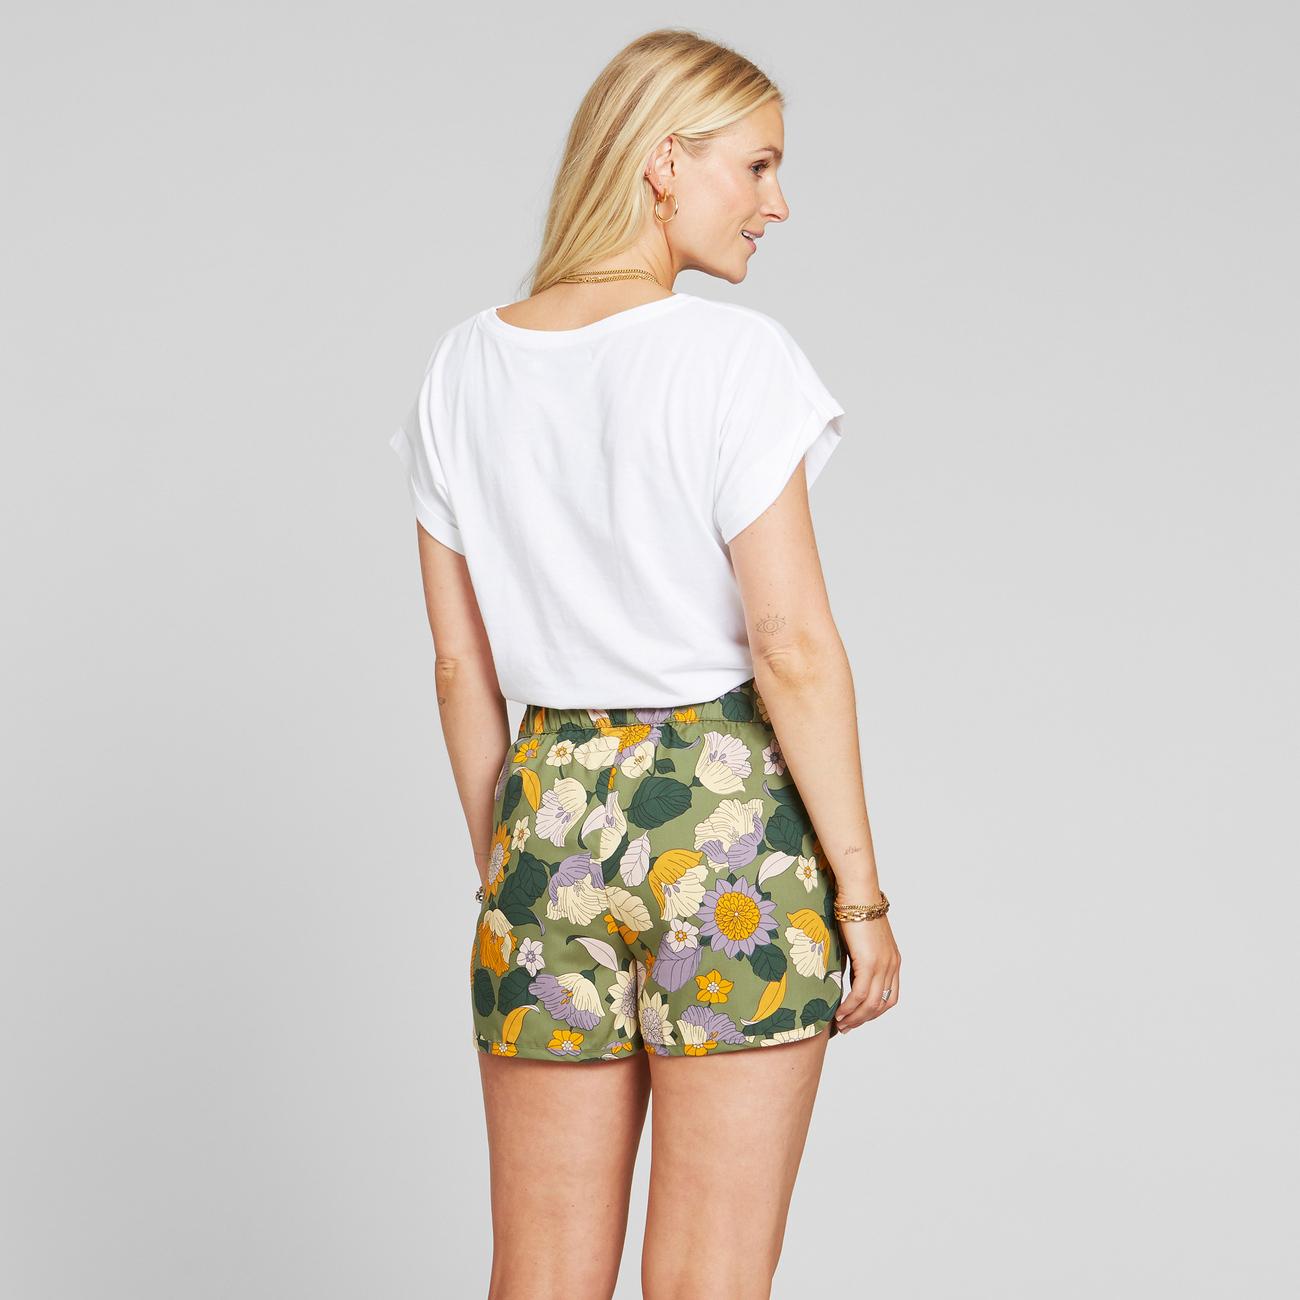 Shorts Sandvika Seventies Floral Green